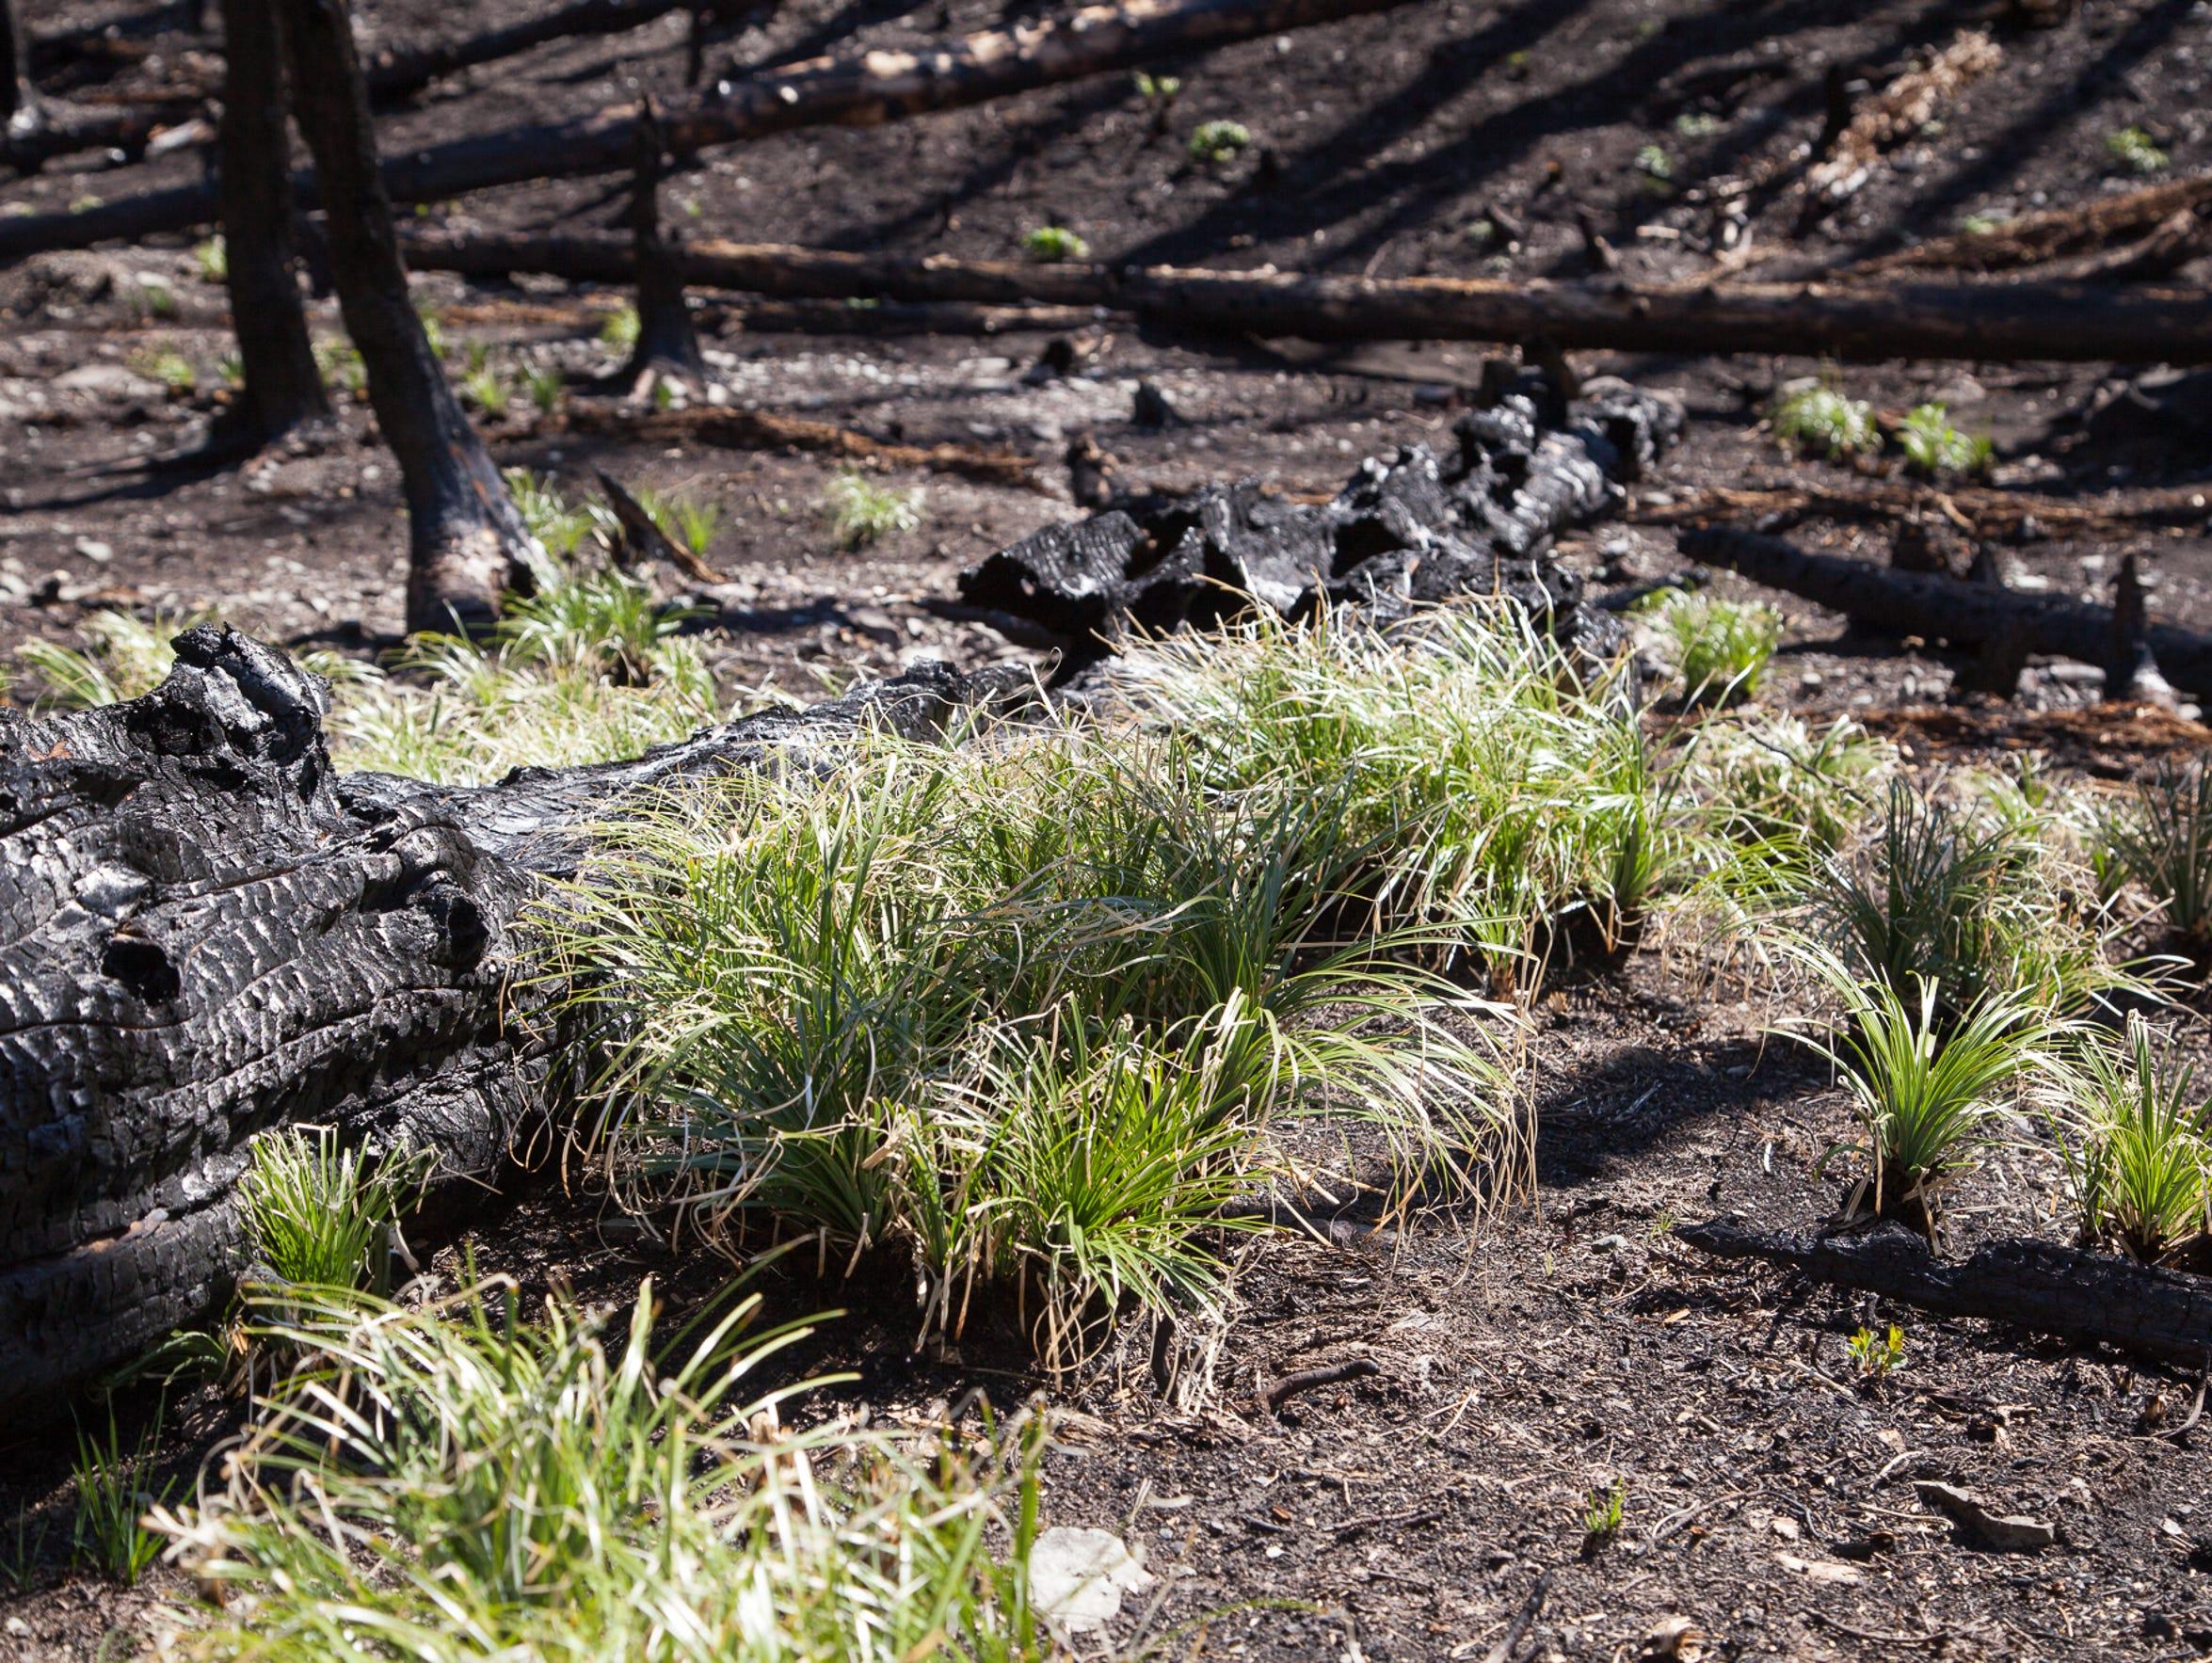 Bear grass grows from surviving underground buds in